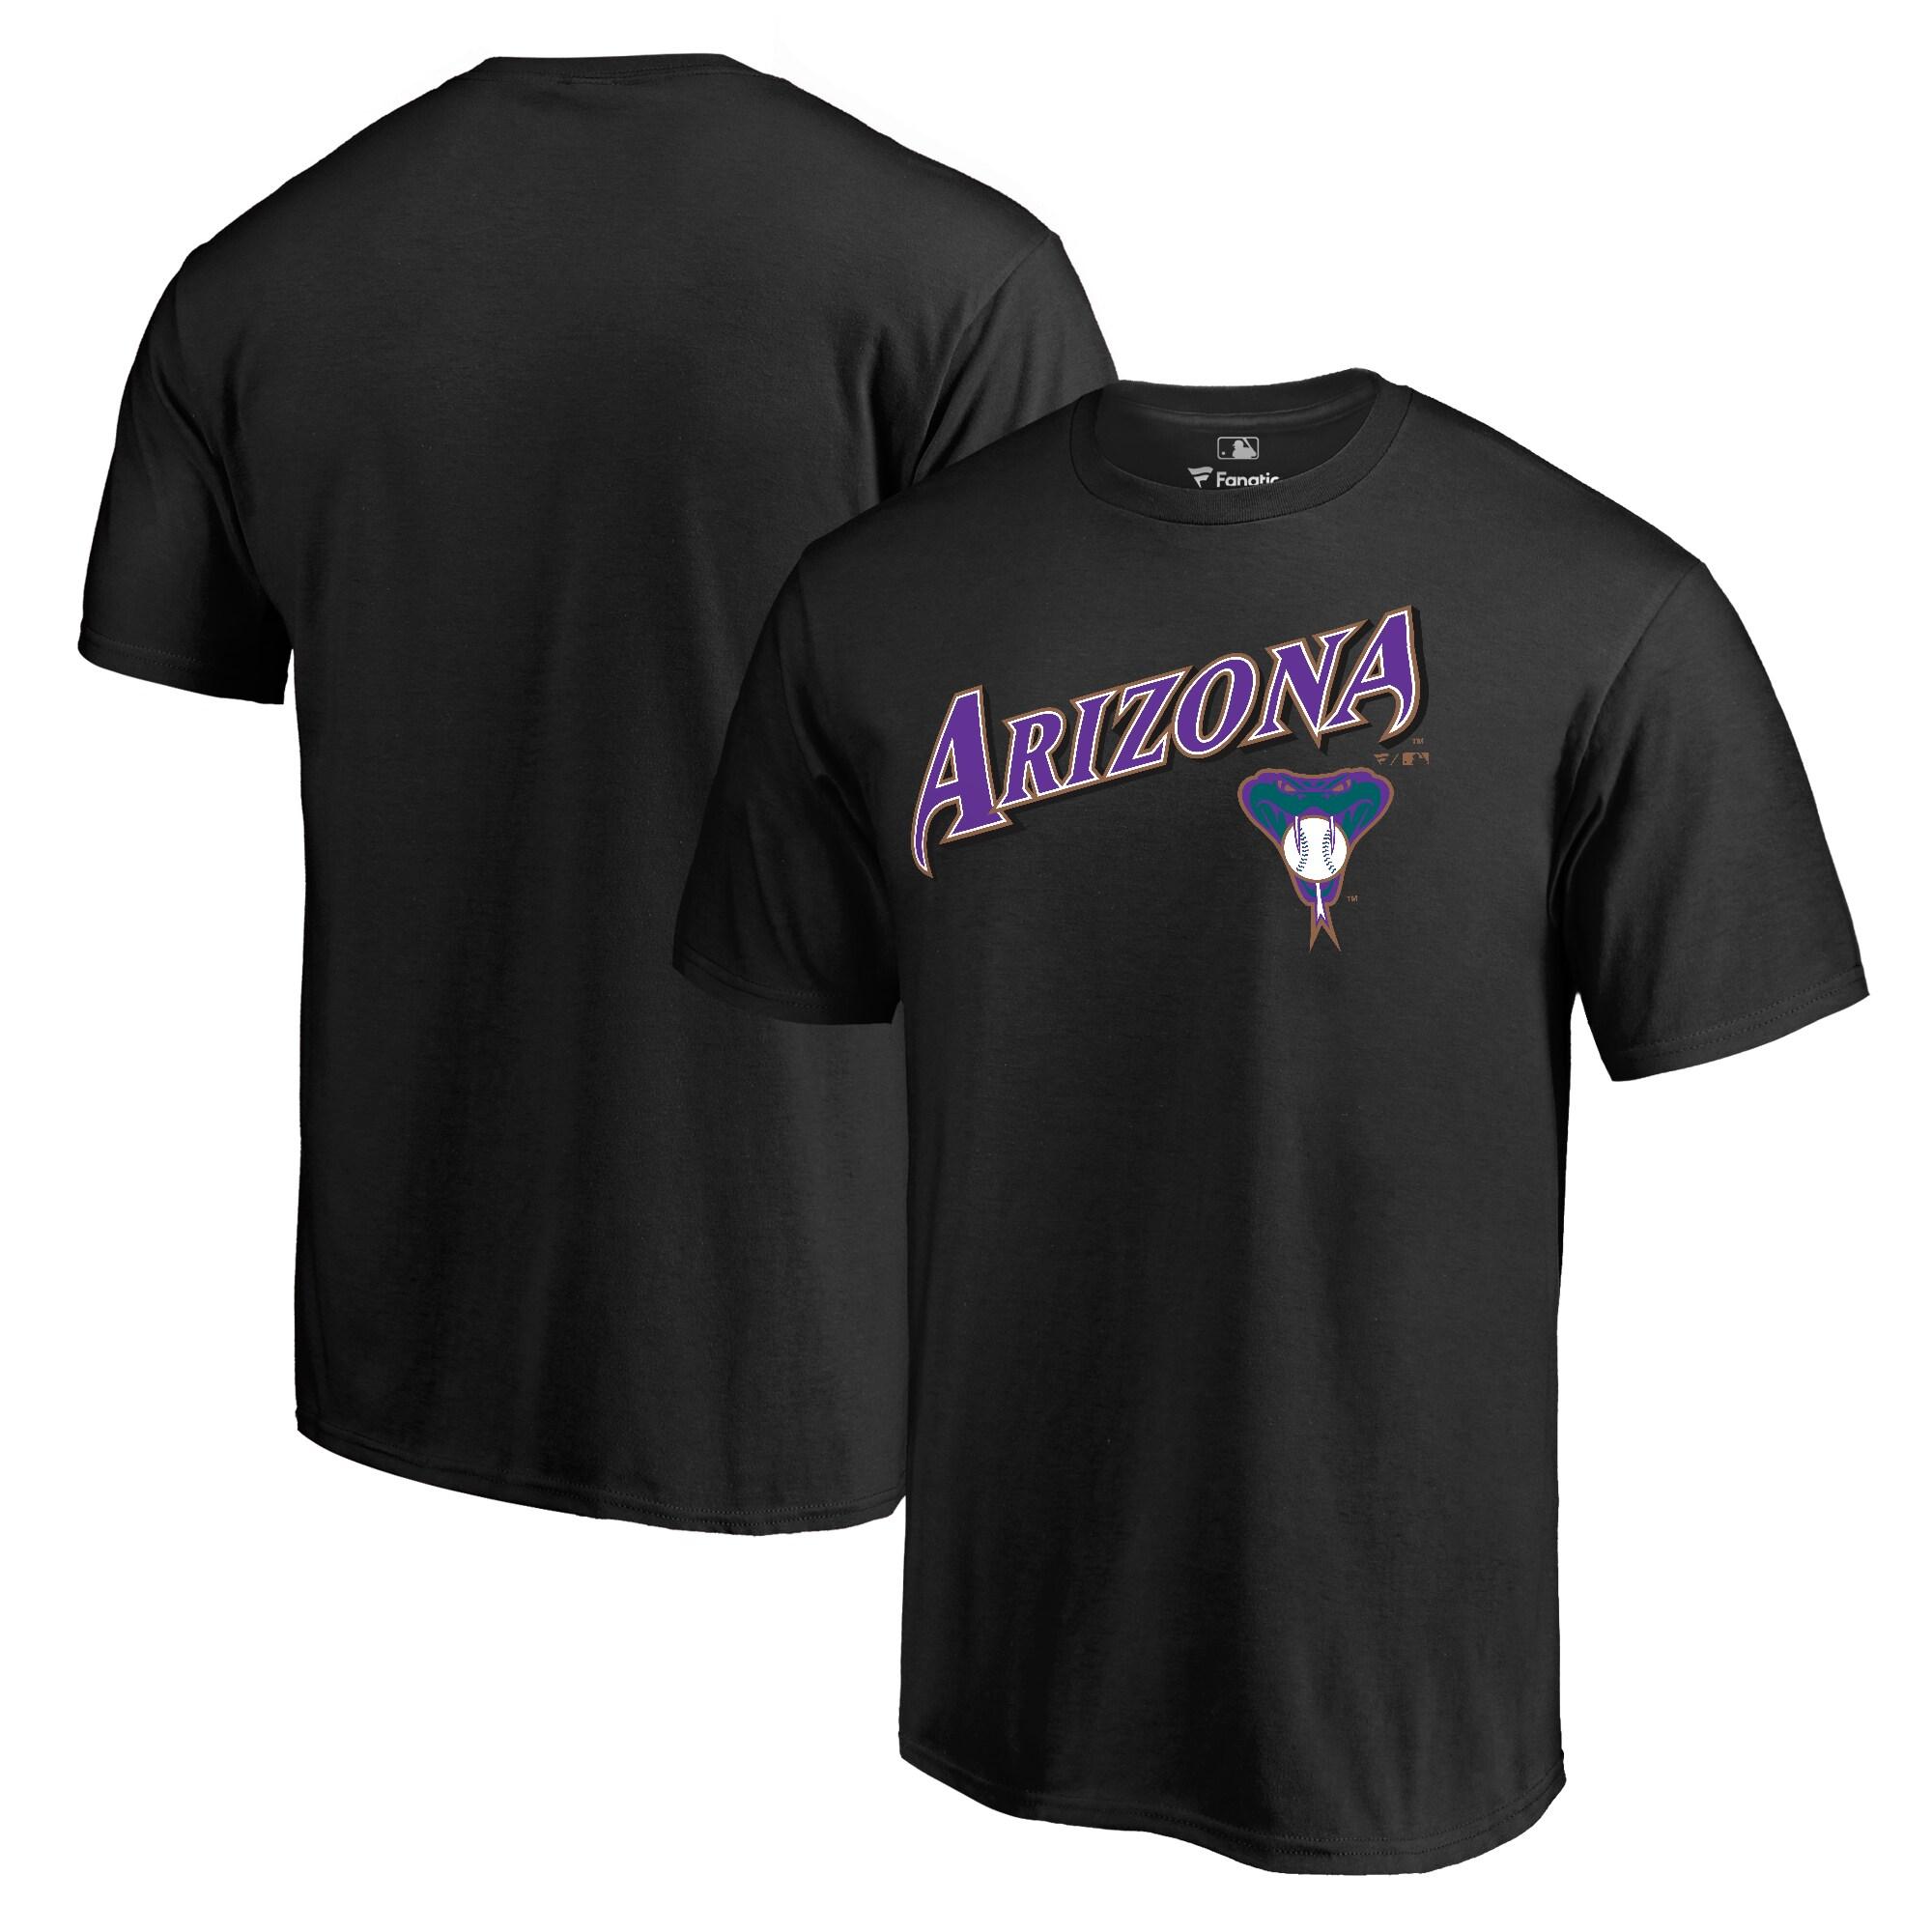 Arizona Diamondbacks Fanatics Branded Big & Tall Cooperstown Collection Wahconah T-Shirt - Black